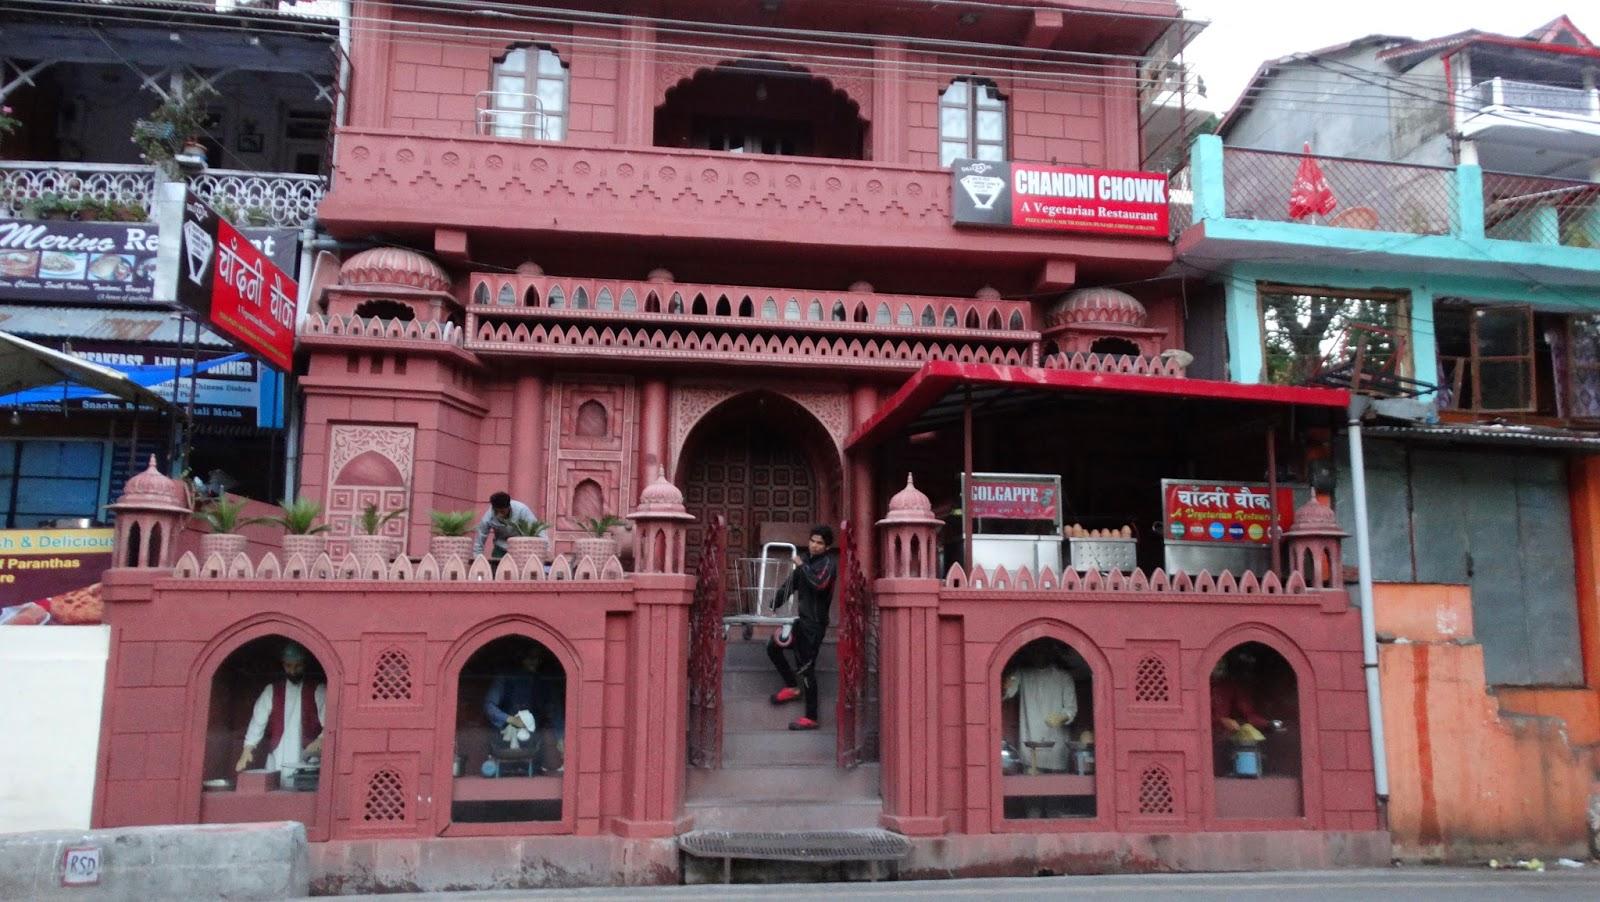 Chandni Chowk, Nainital